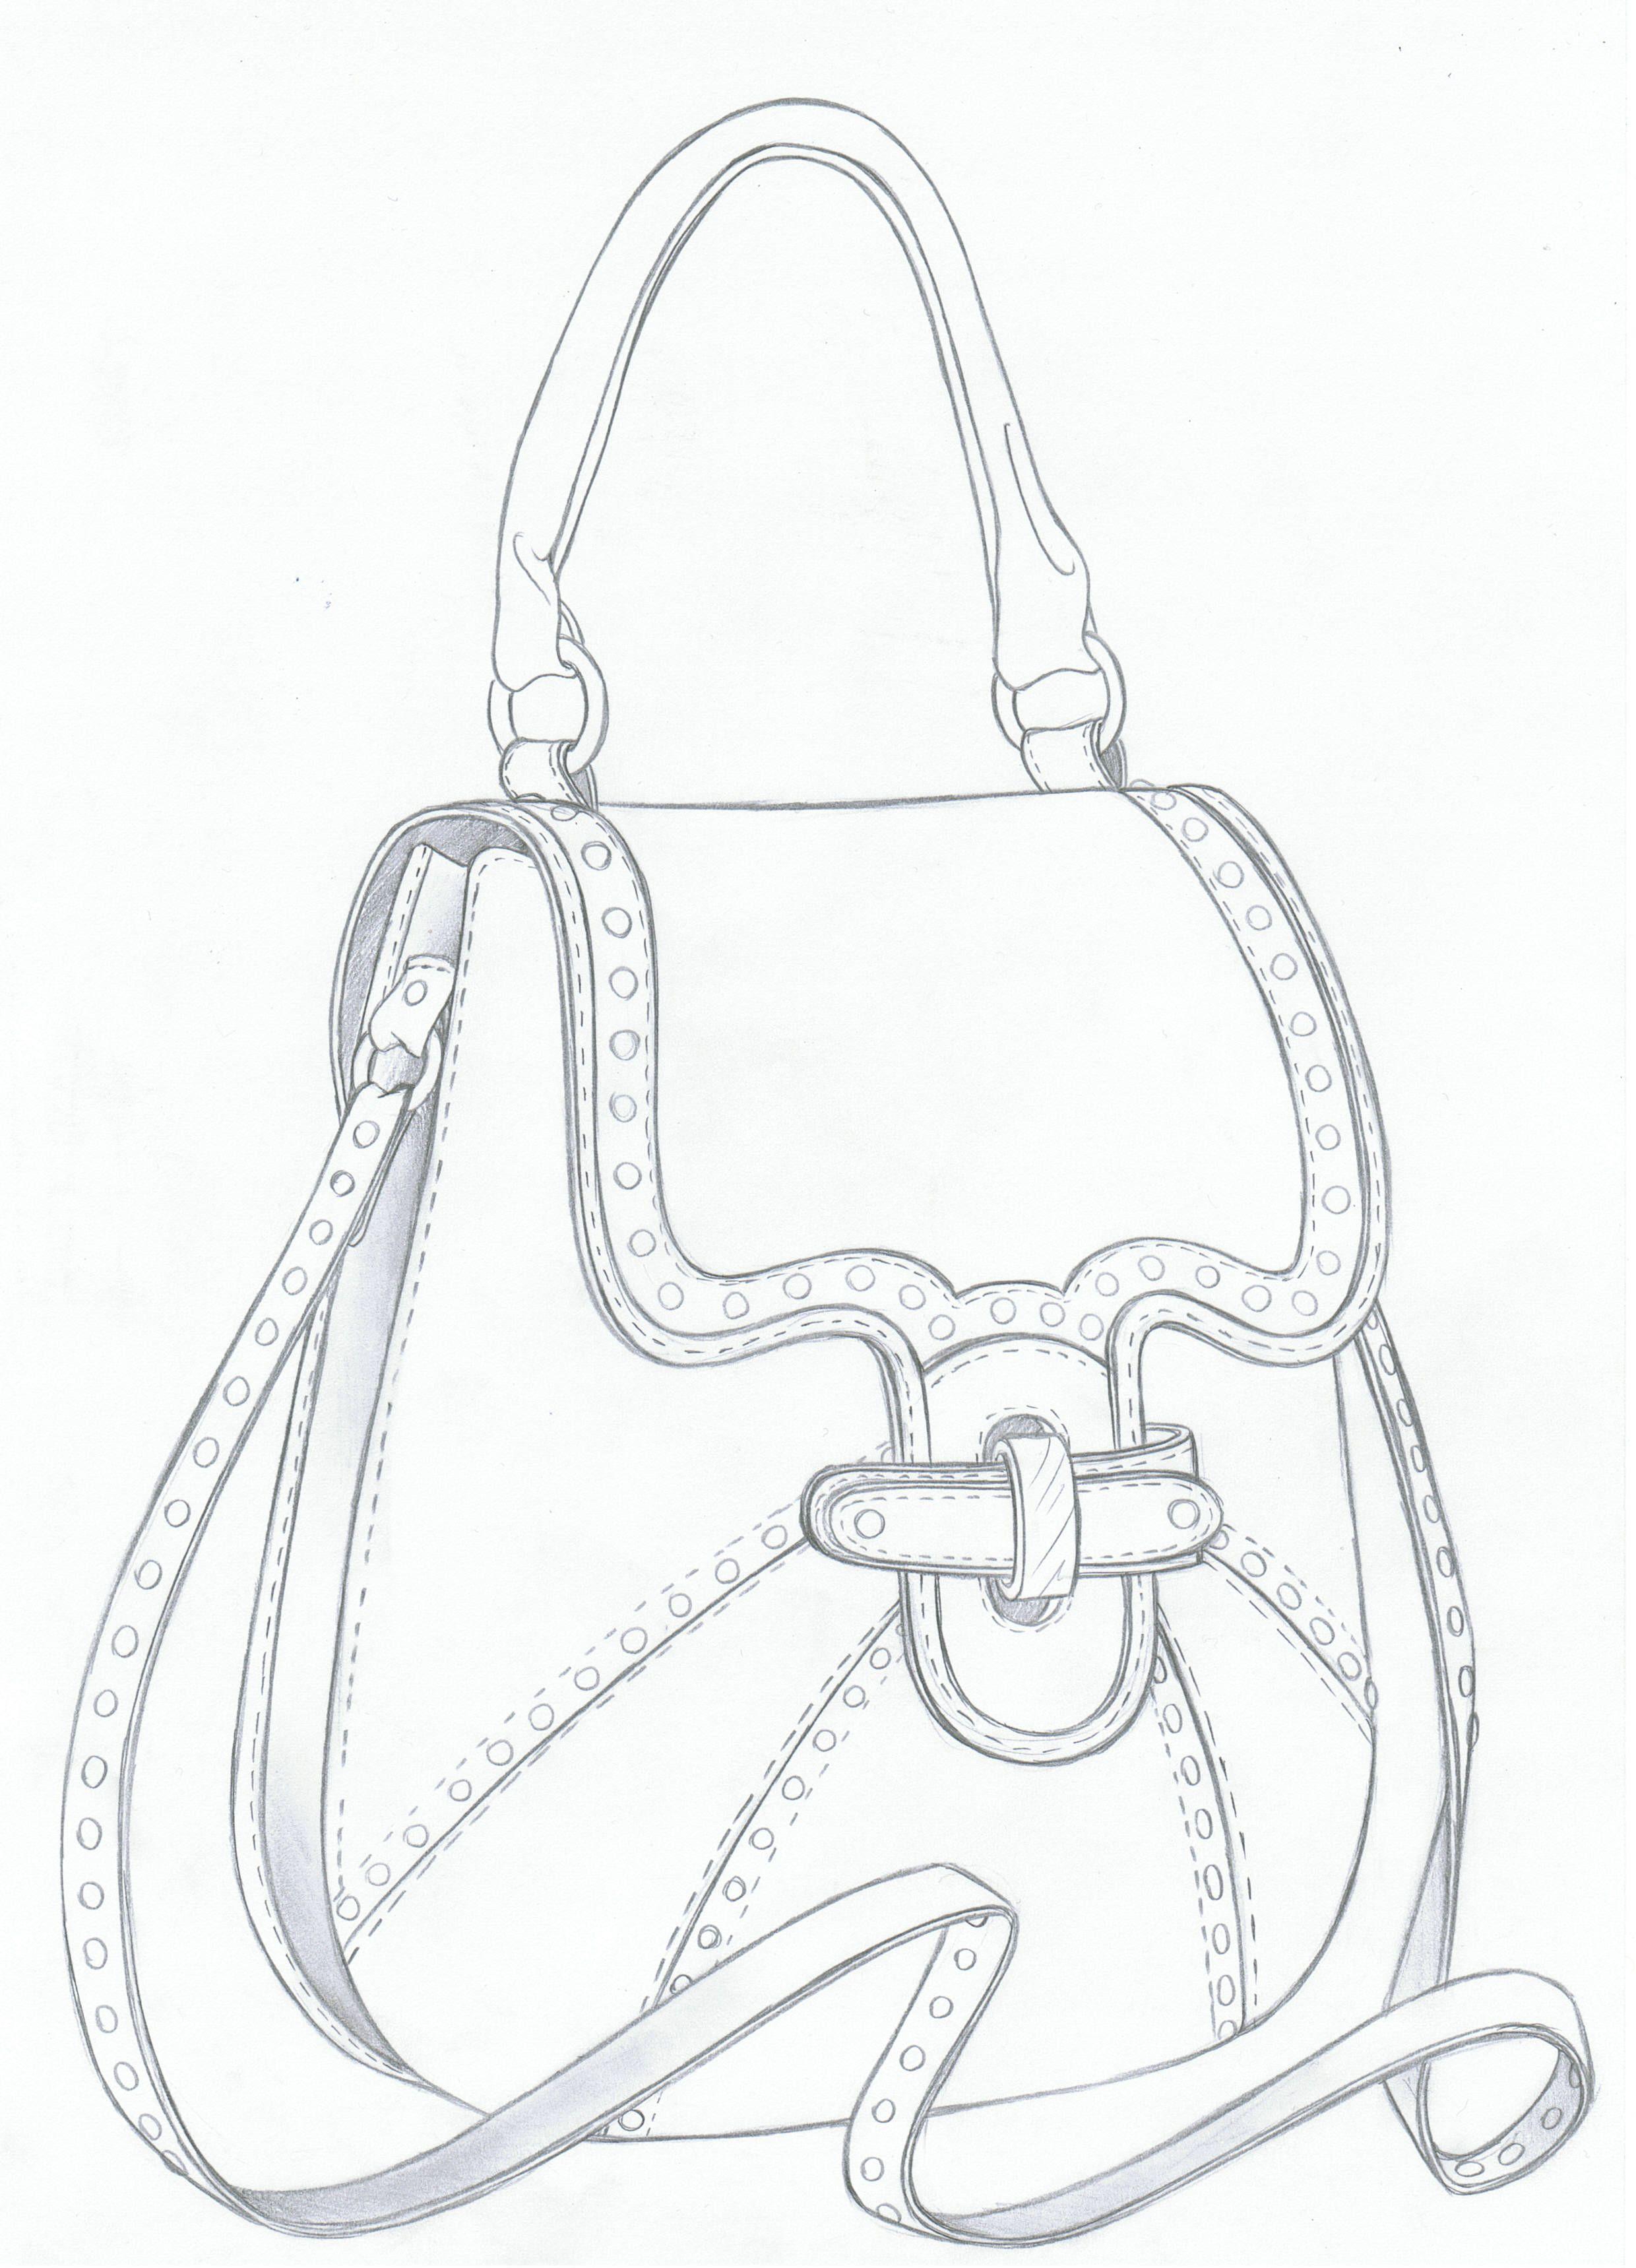 Pin von Nesreen El-Nakib fashion auf bags | Pinterest | Schablone ...